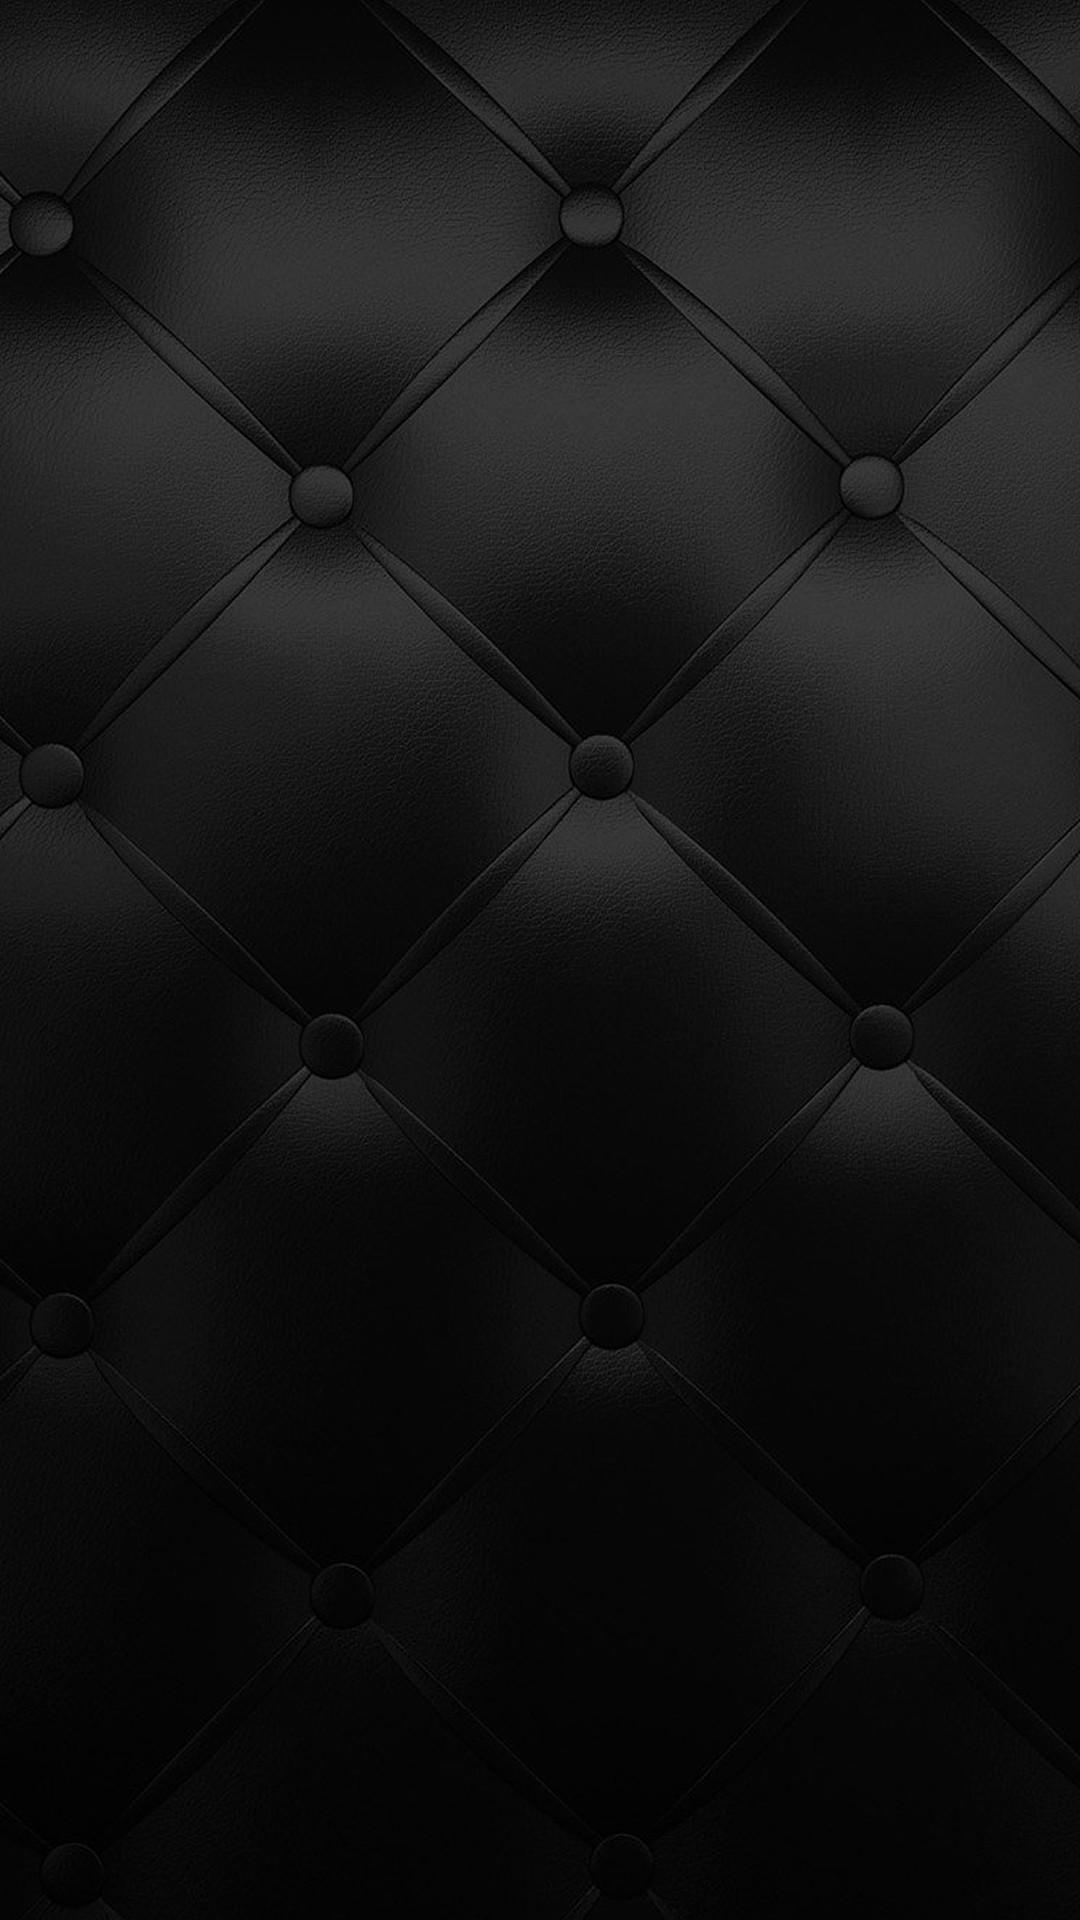 Invisible iOS Home Screen Icons – David Smith